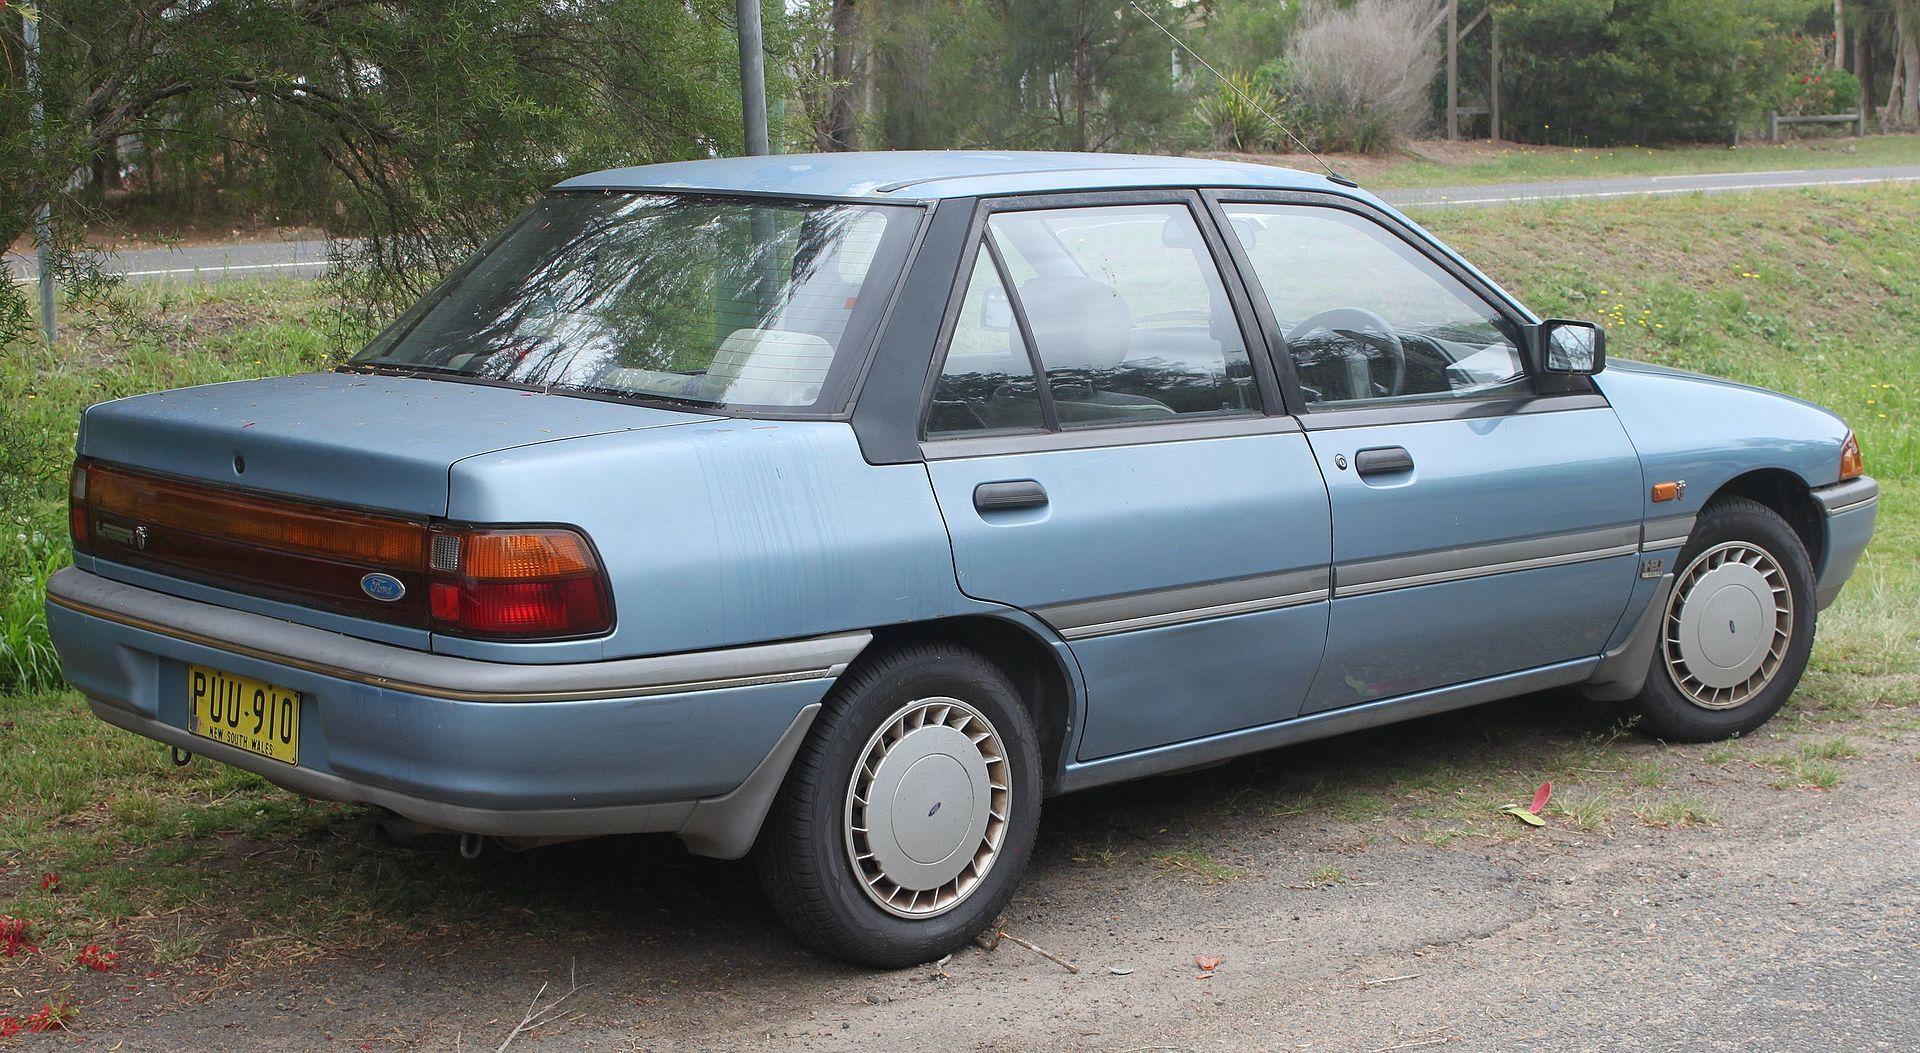 1990 Ford Laser Kf Ghia Sedan 22514037076 Ford Laser